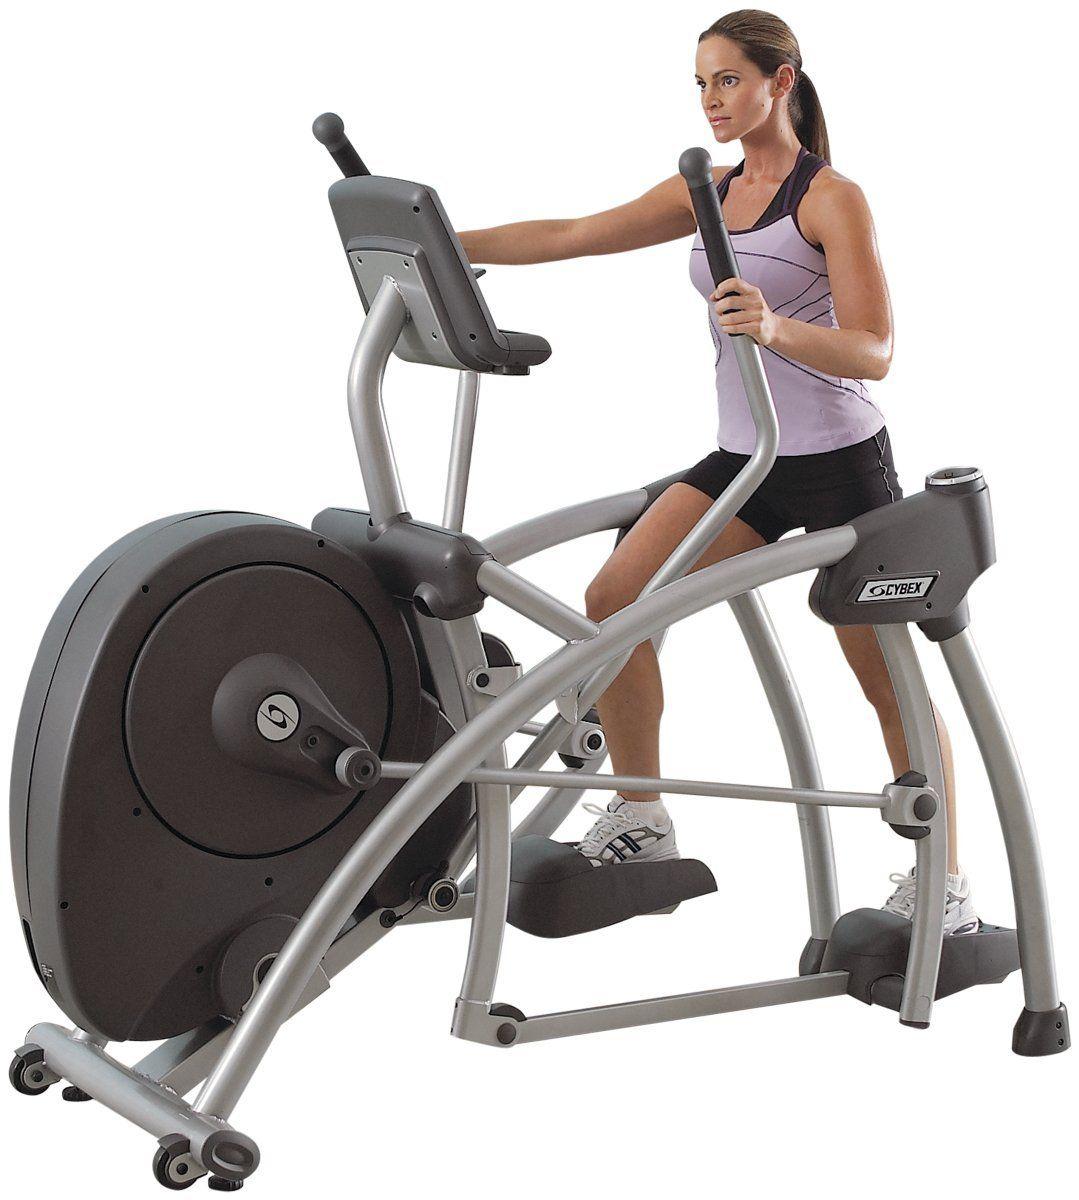 Affordable cybex cardio equipment arc trainer cardio